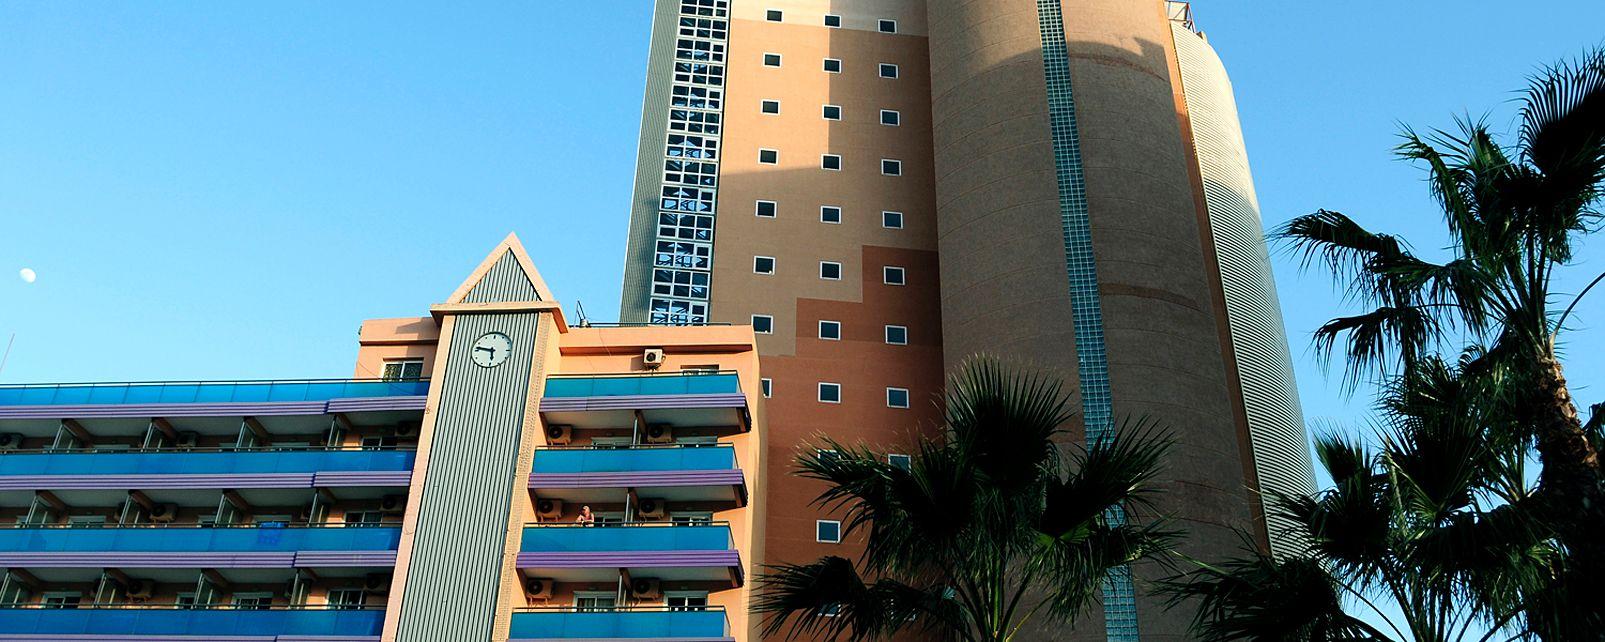 Hôtel Benidorm Plaza